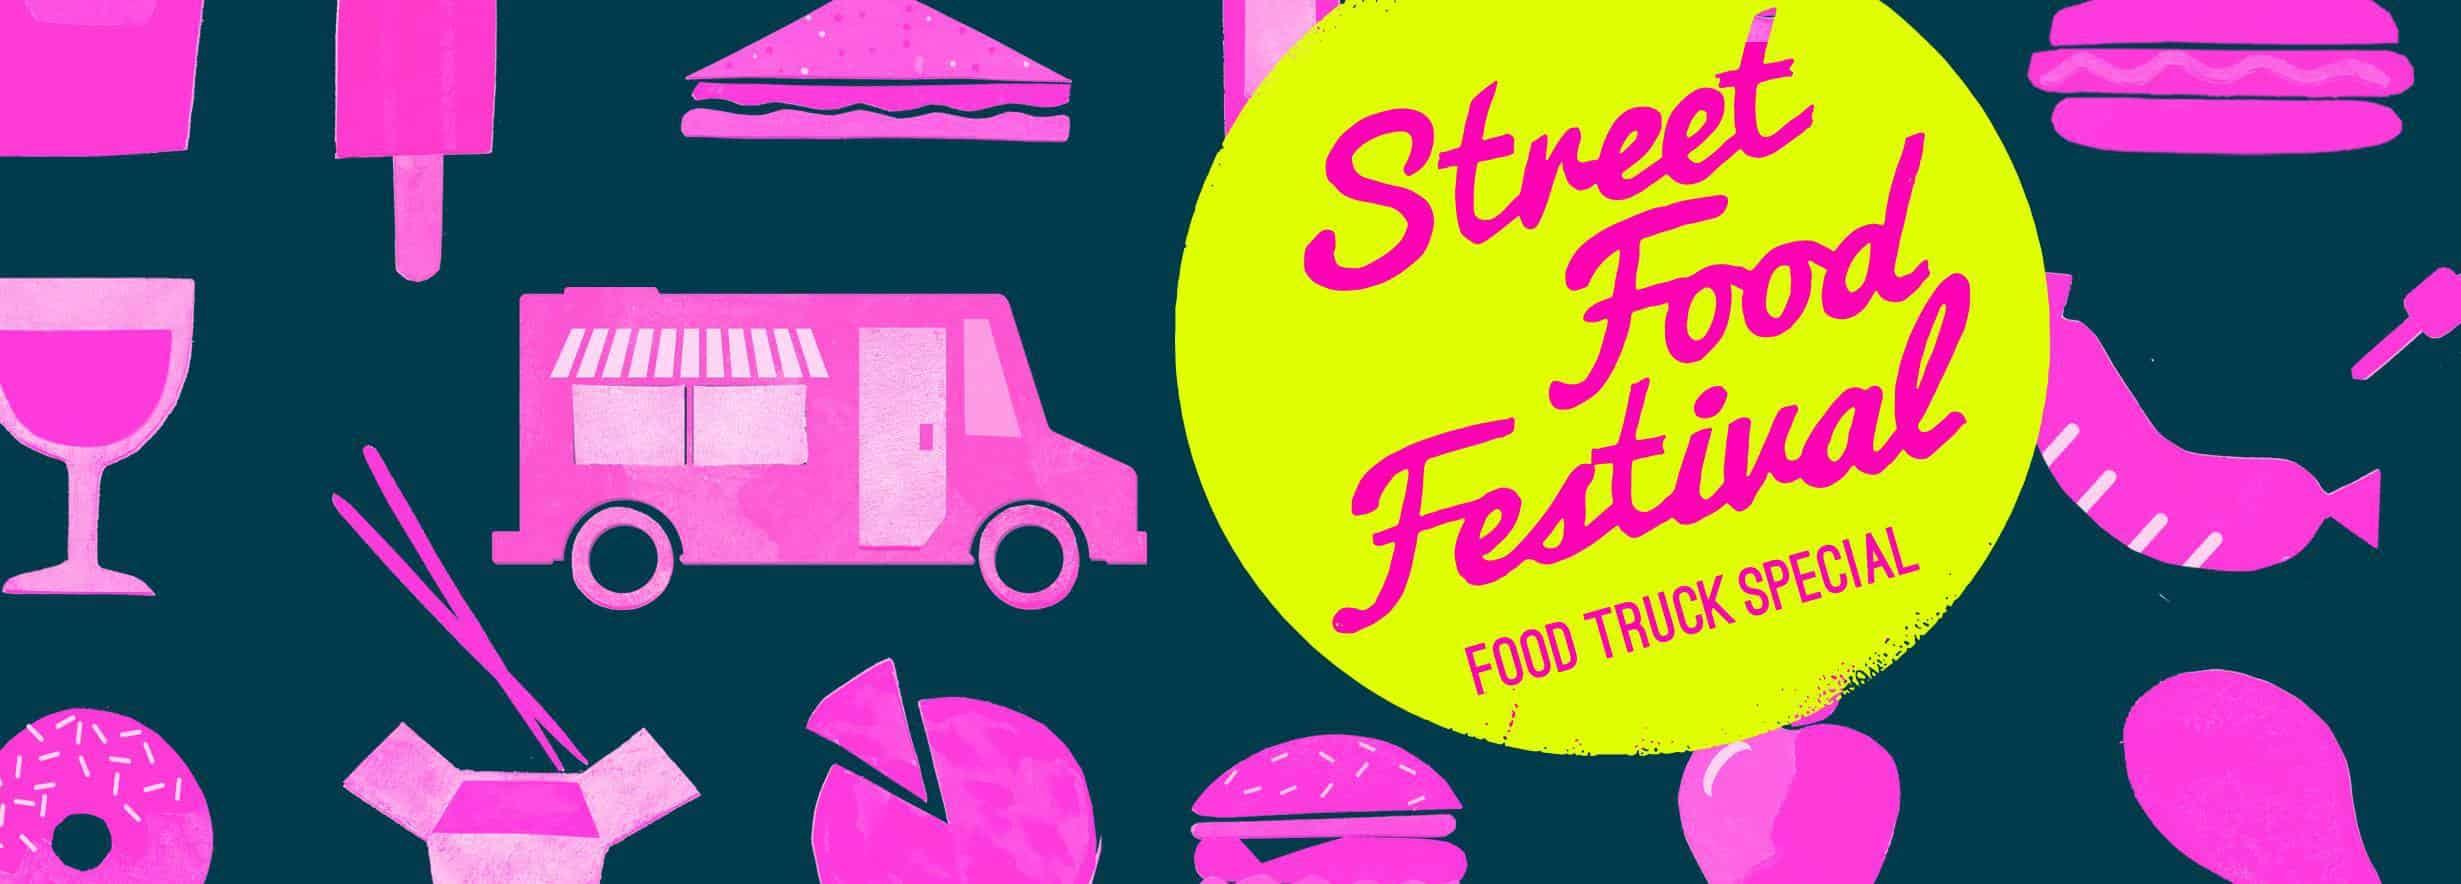 Street food Festival Truck Special Zurich